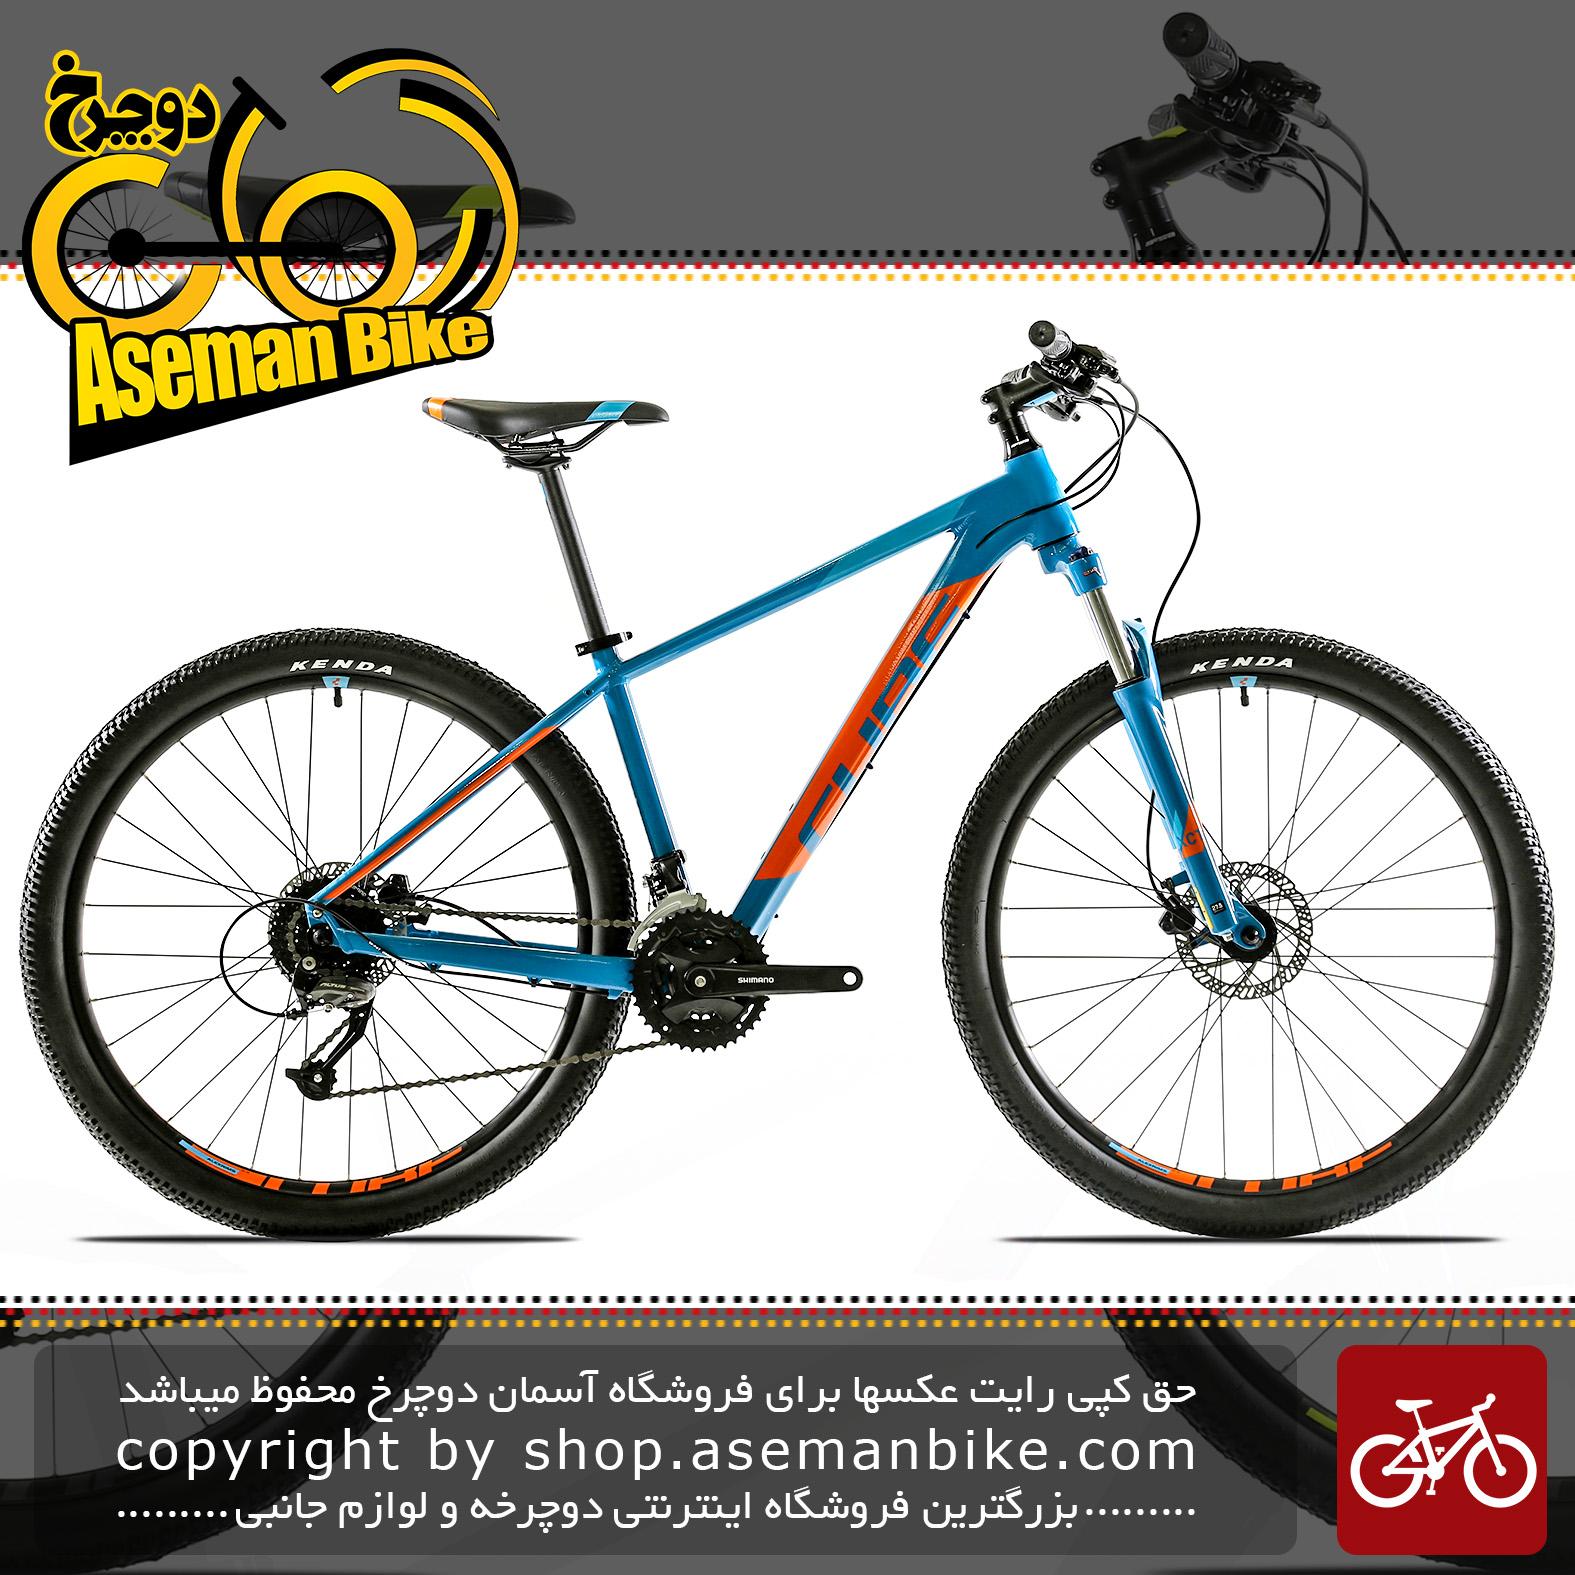 دوچرخه کوهستان کیوب مدل آیم پرو آبی سایز 27.5 2018 CUBE Mountain Bike AIM PRO 27.5 2018